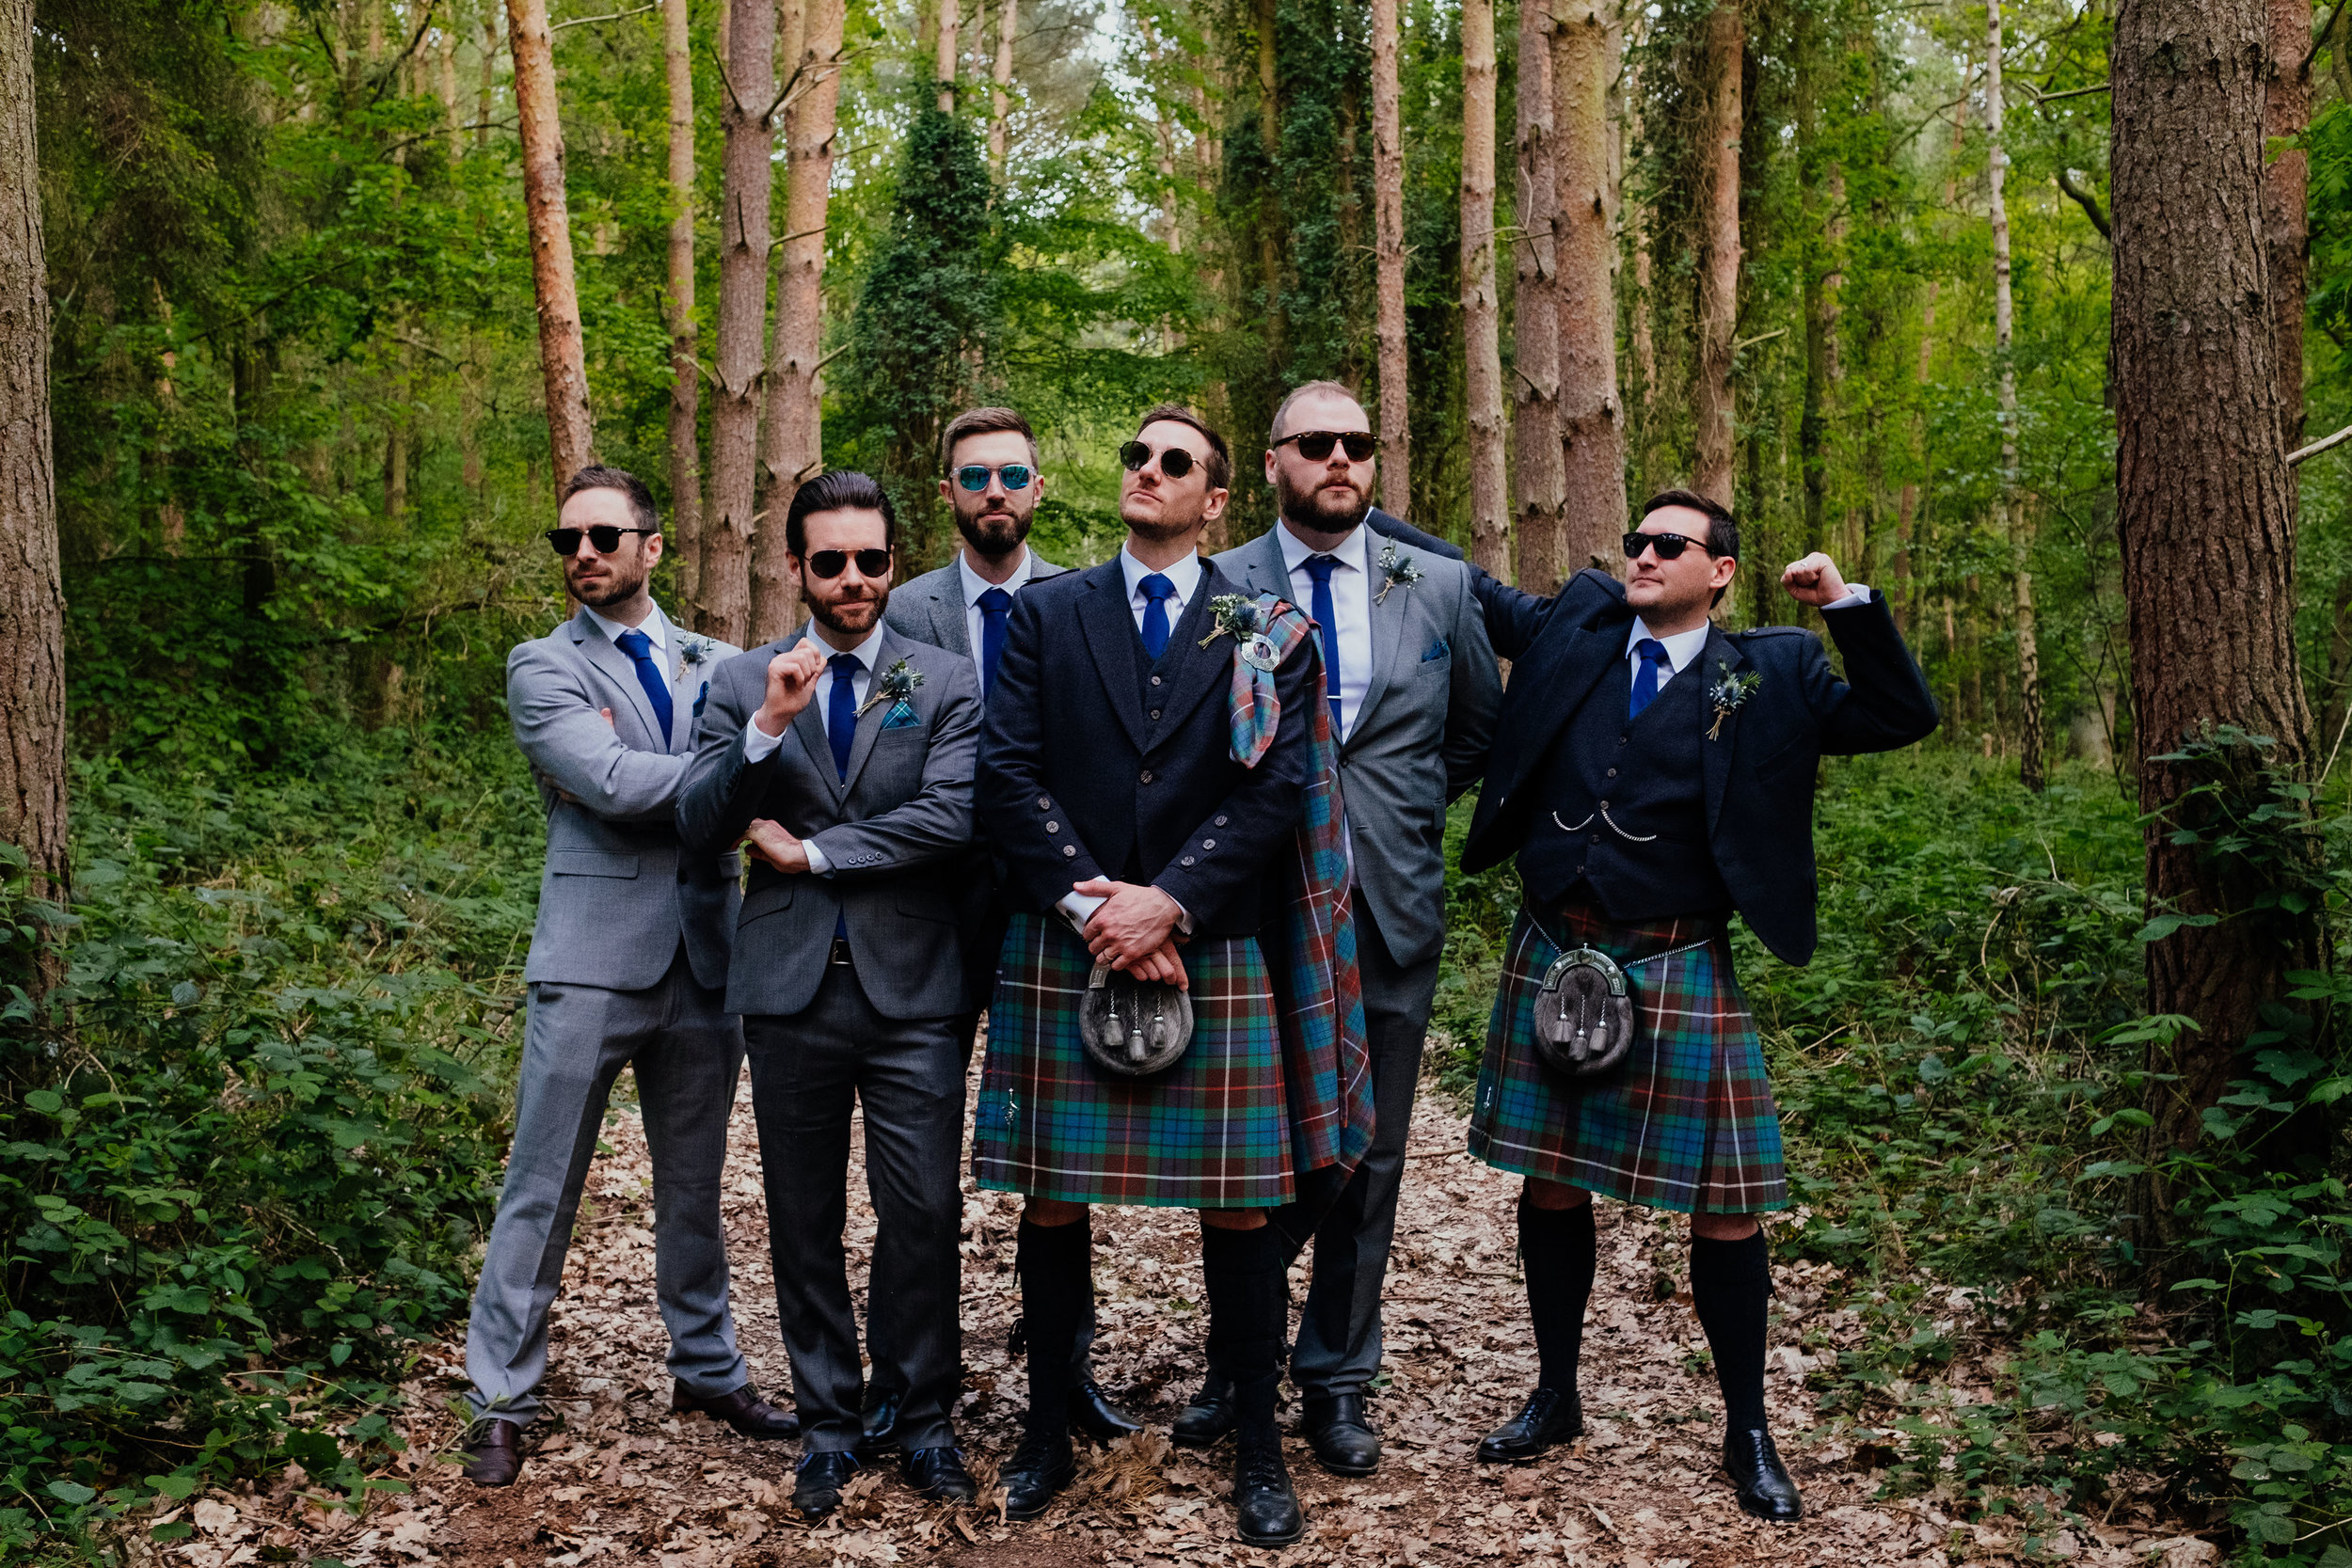 Groom and Groomsmen wearing sunglasses at Captains Wood Barn wedding